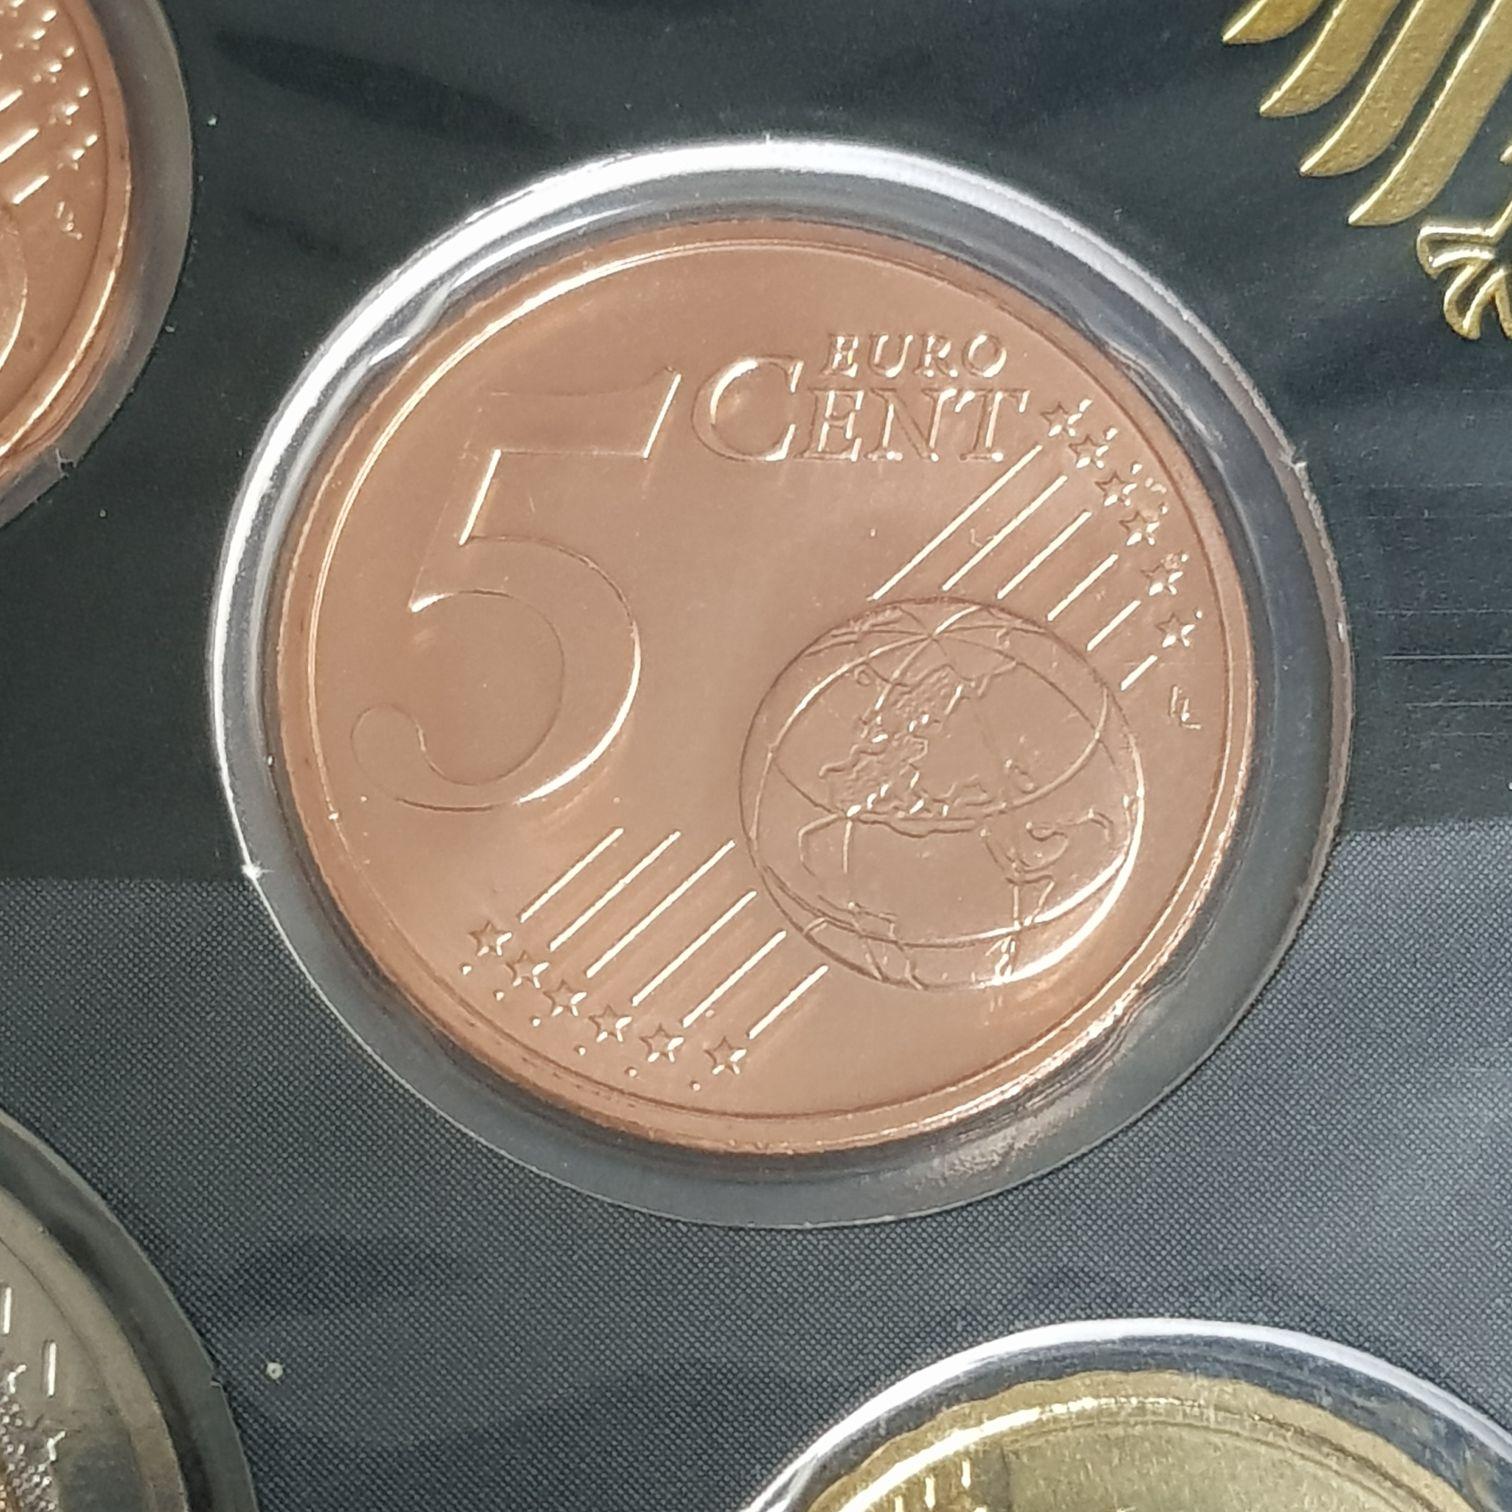 .05 Centavos De Euro Coin - $.05 (2016) front image (front cover)